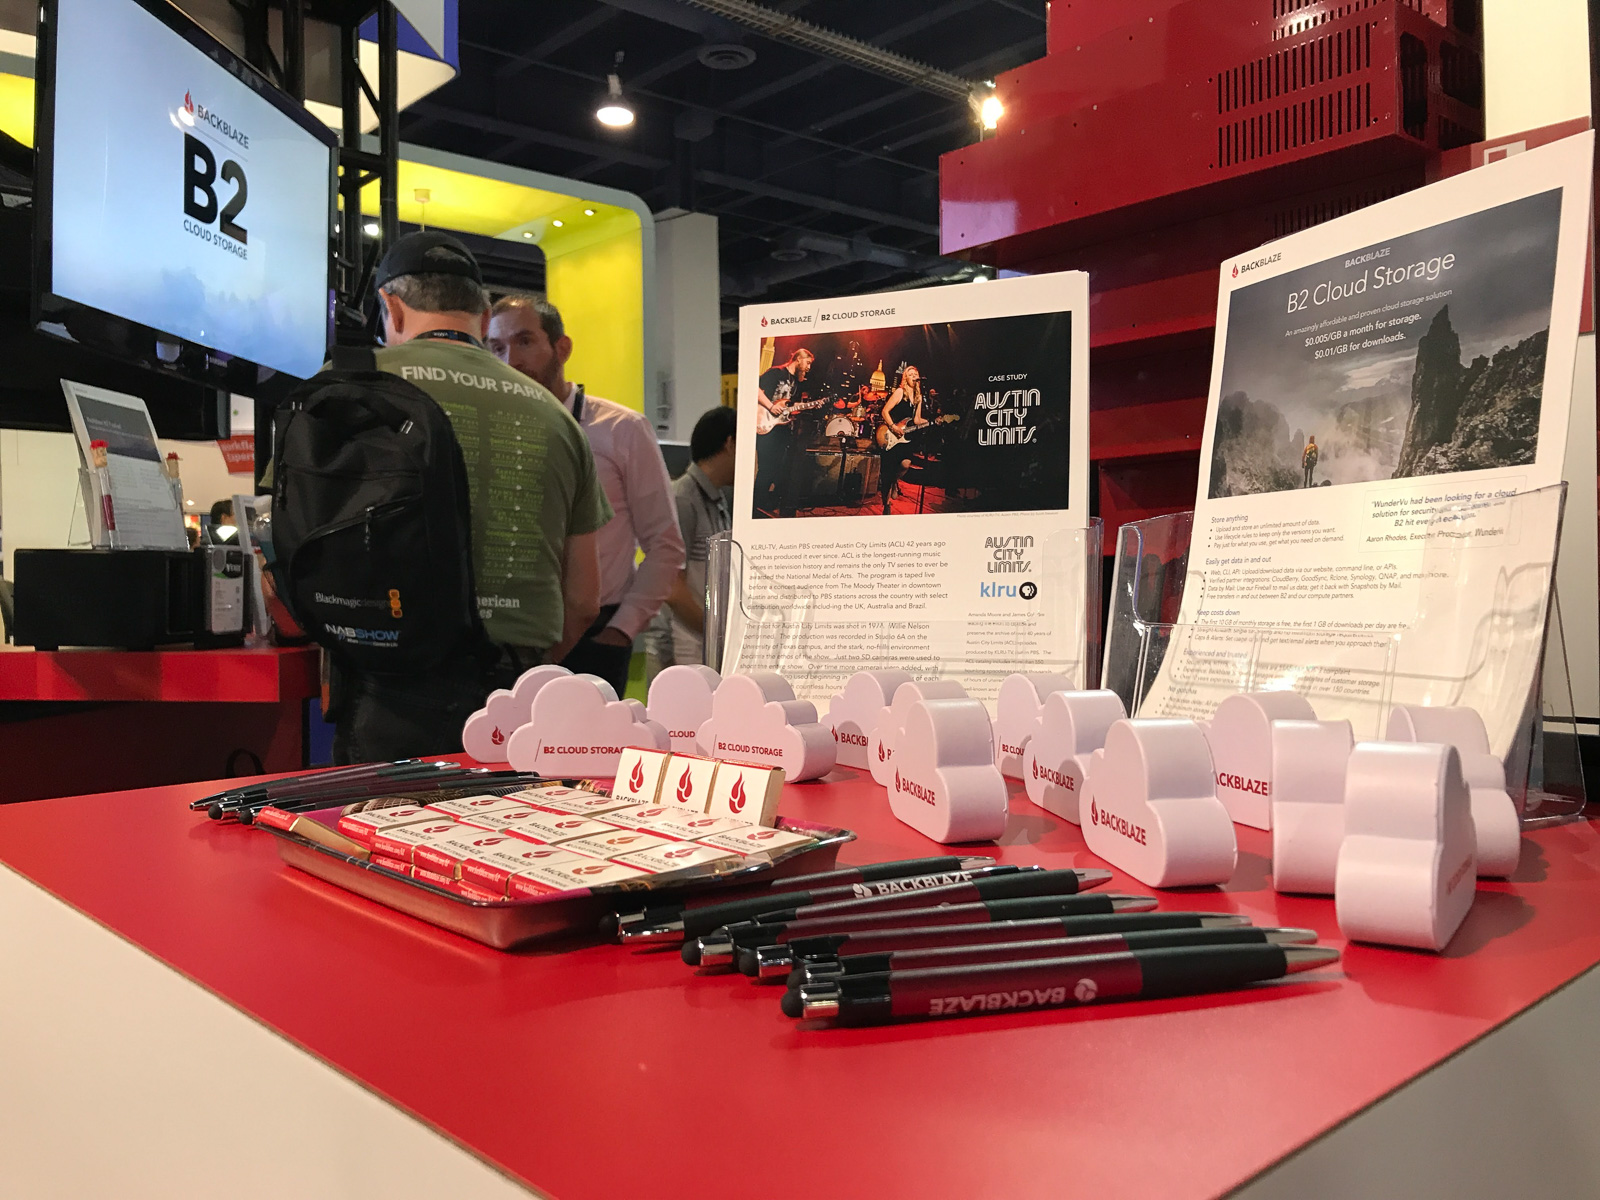 Backblaze Case Studies and Swag at NAB 2018 in Las Vegas